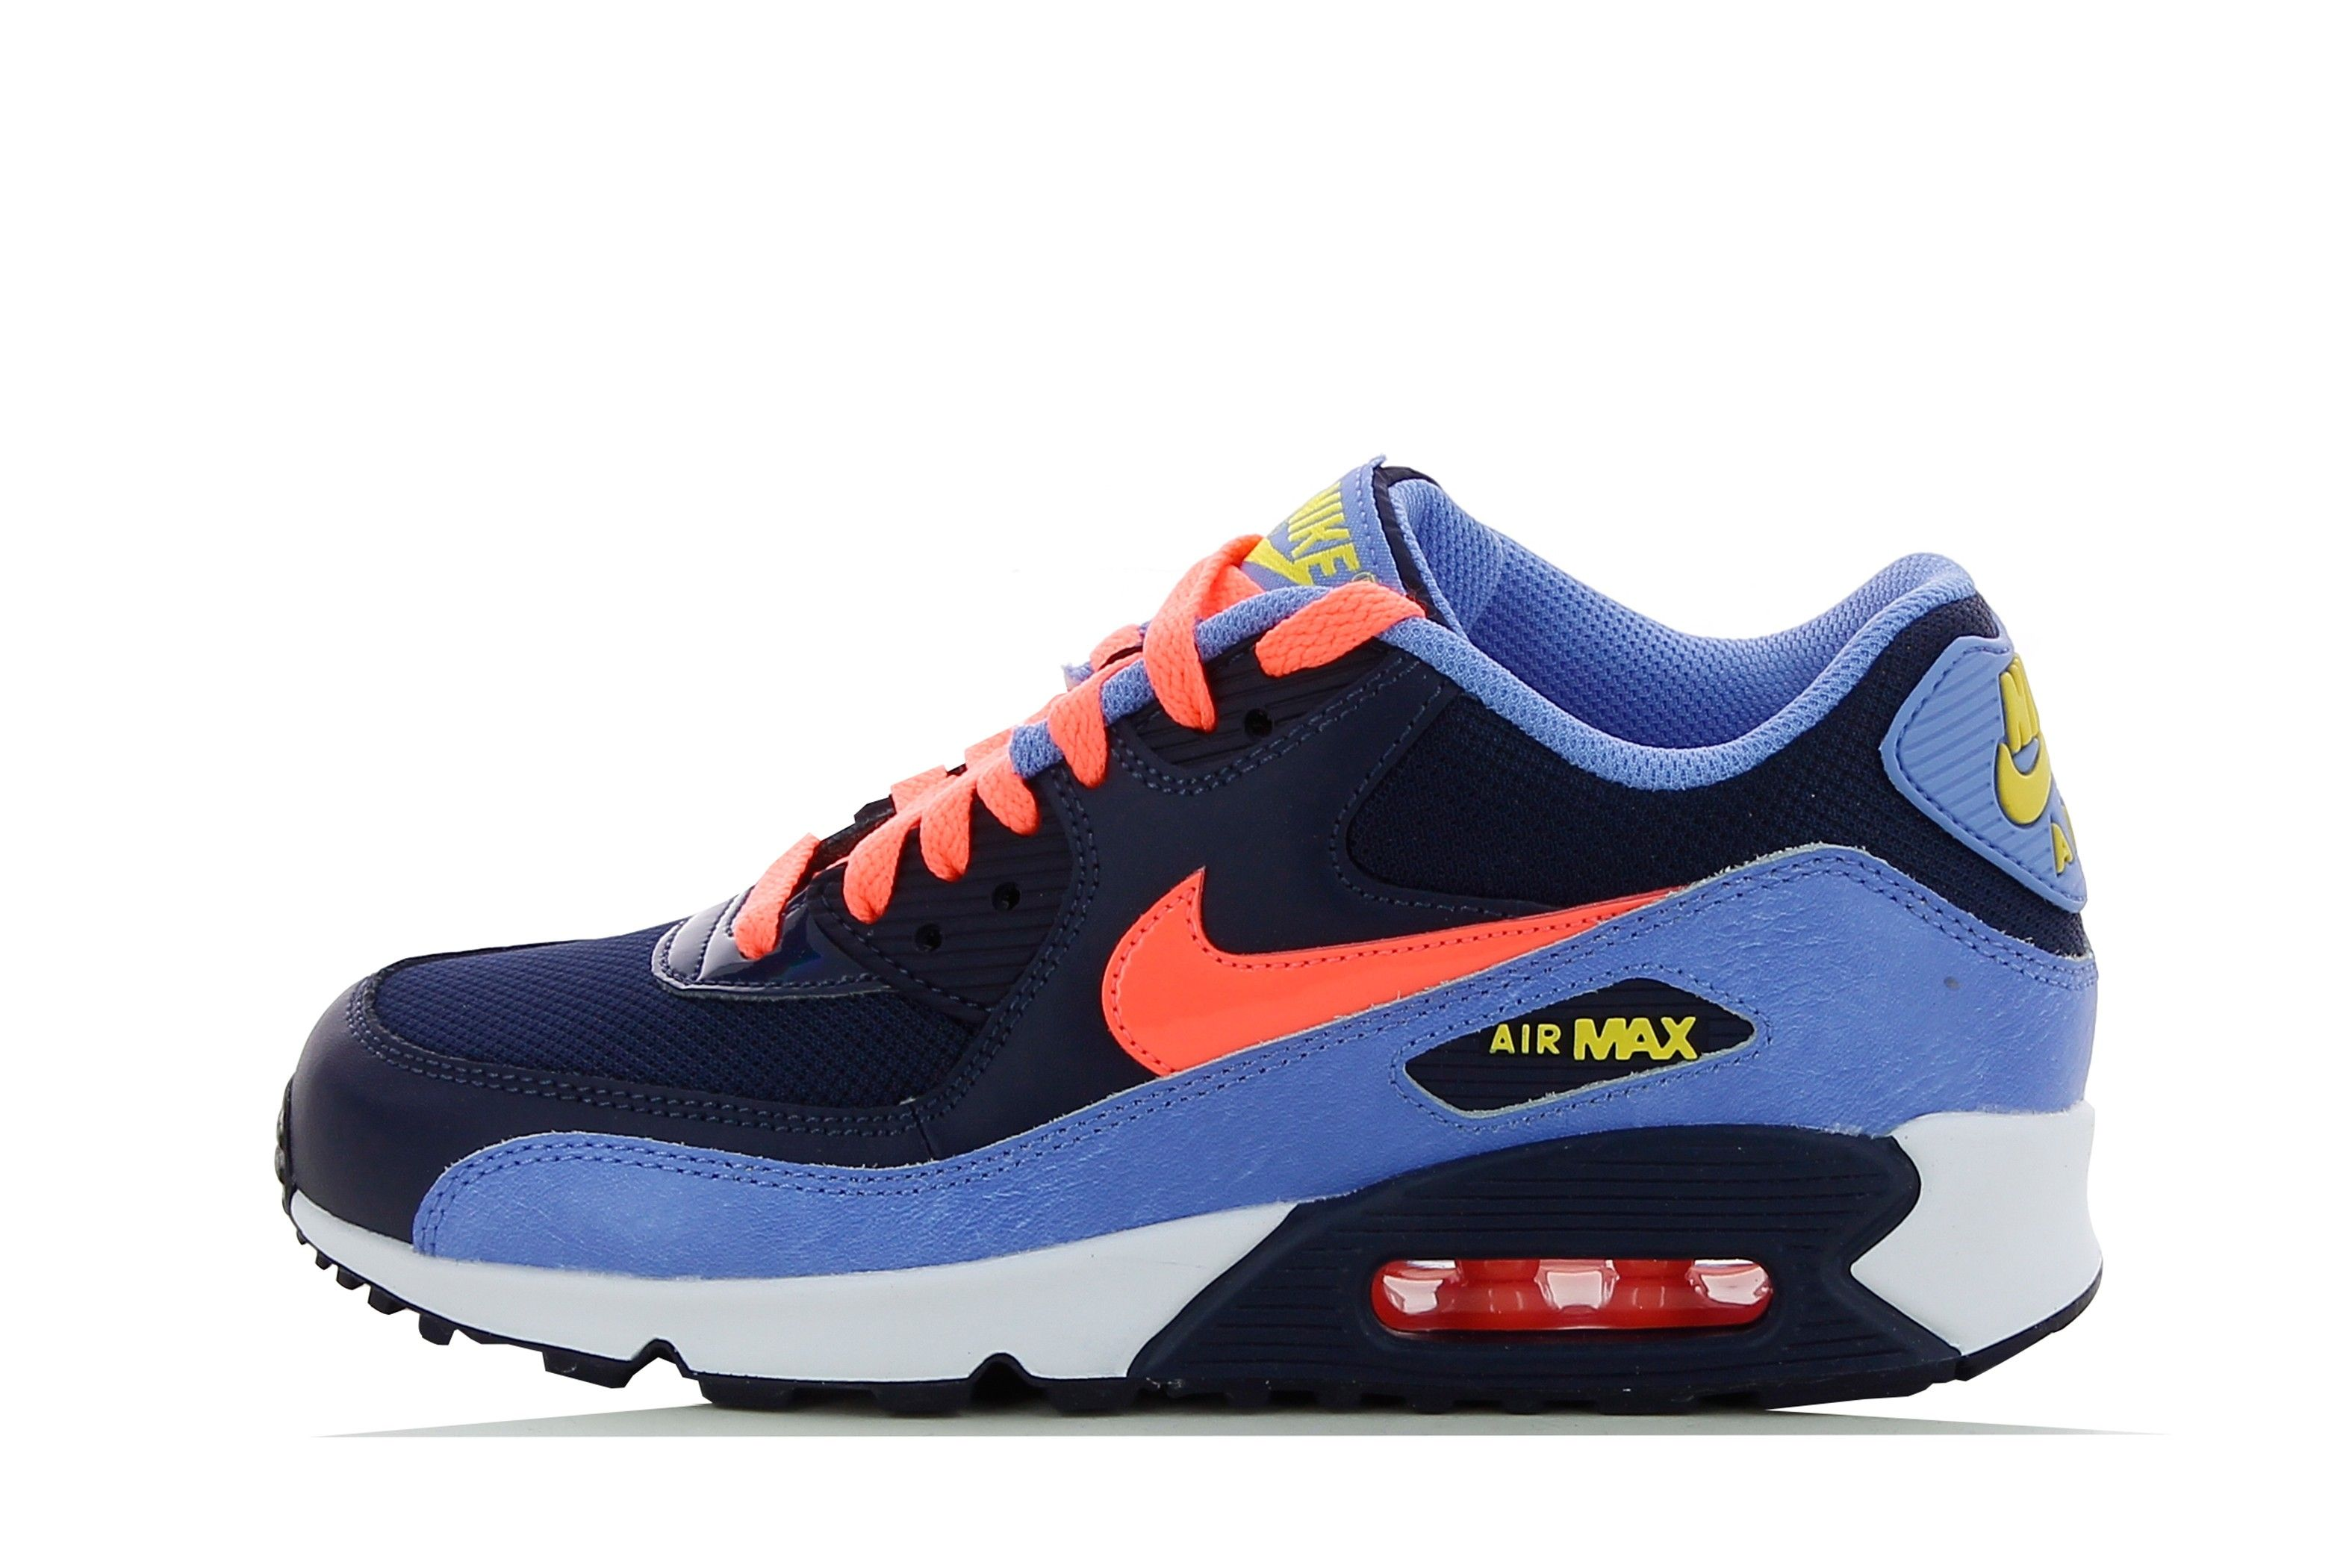 Basket Nike Air Max 90 (GS) 724855 408 Pegashoes